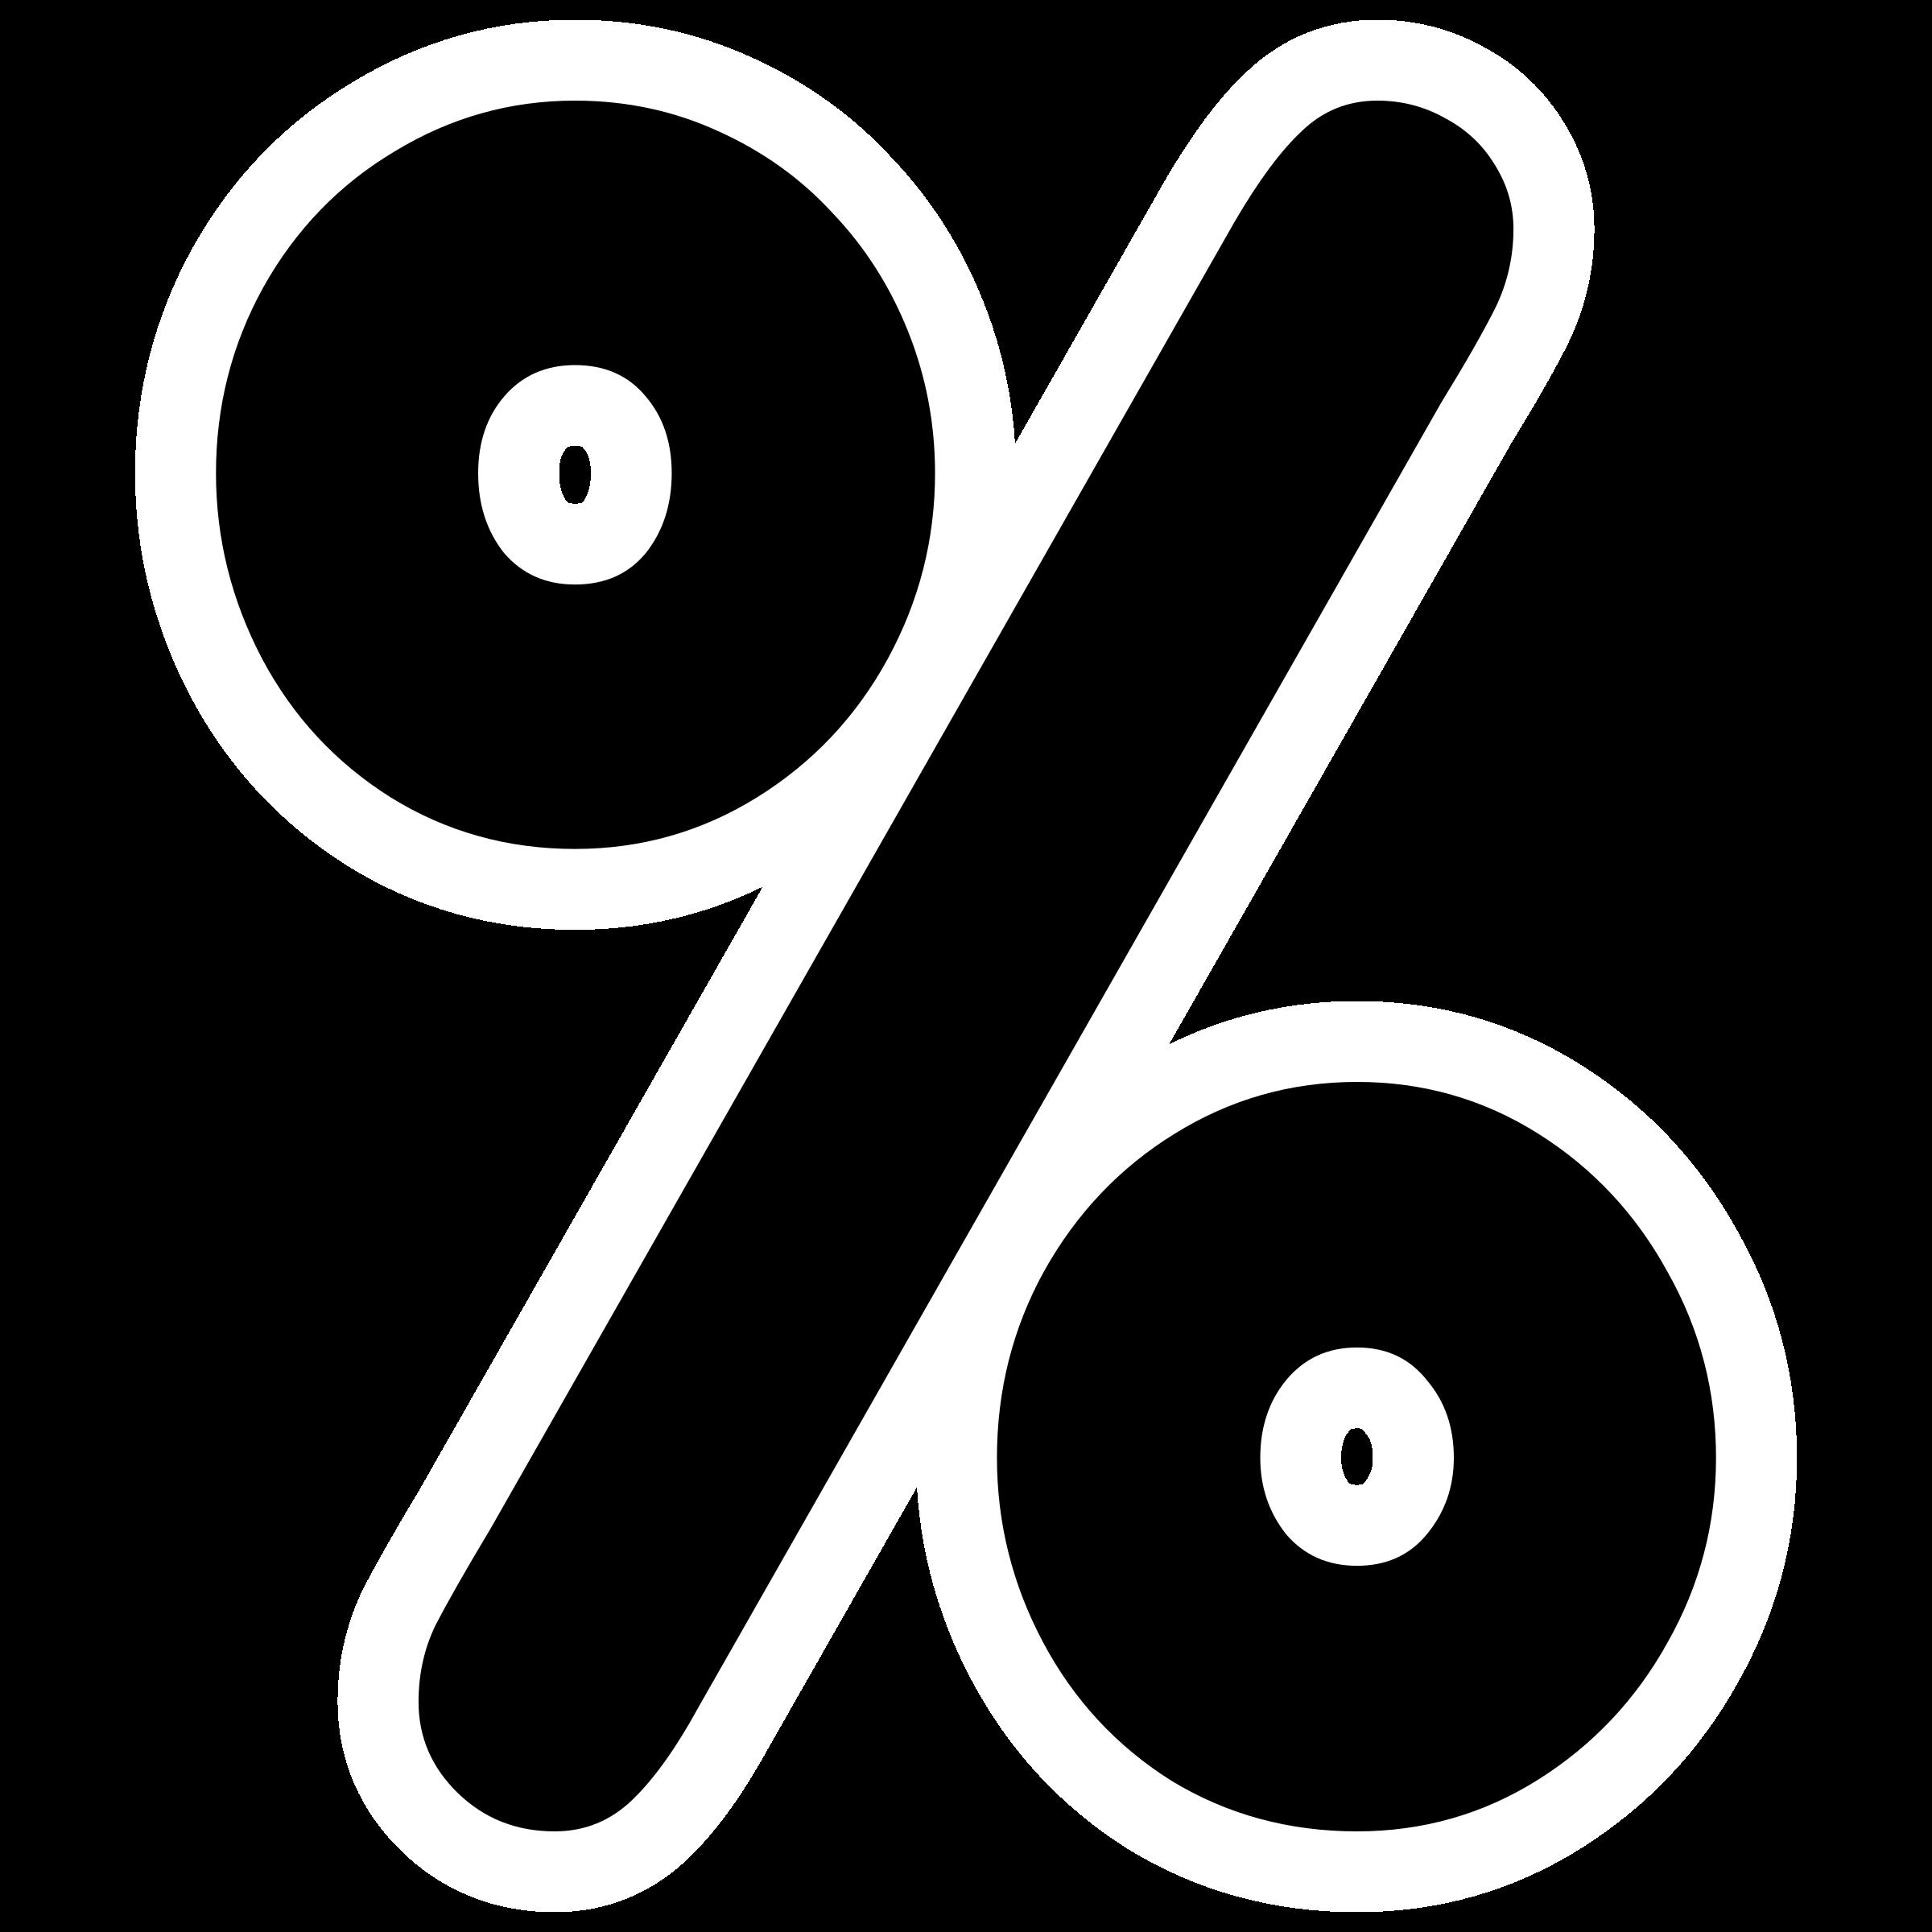 Percentage PNG Transparent Images.